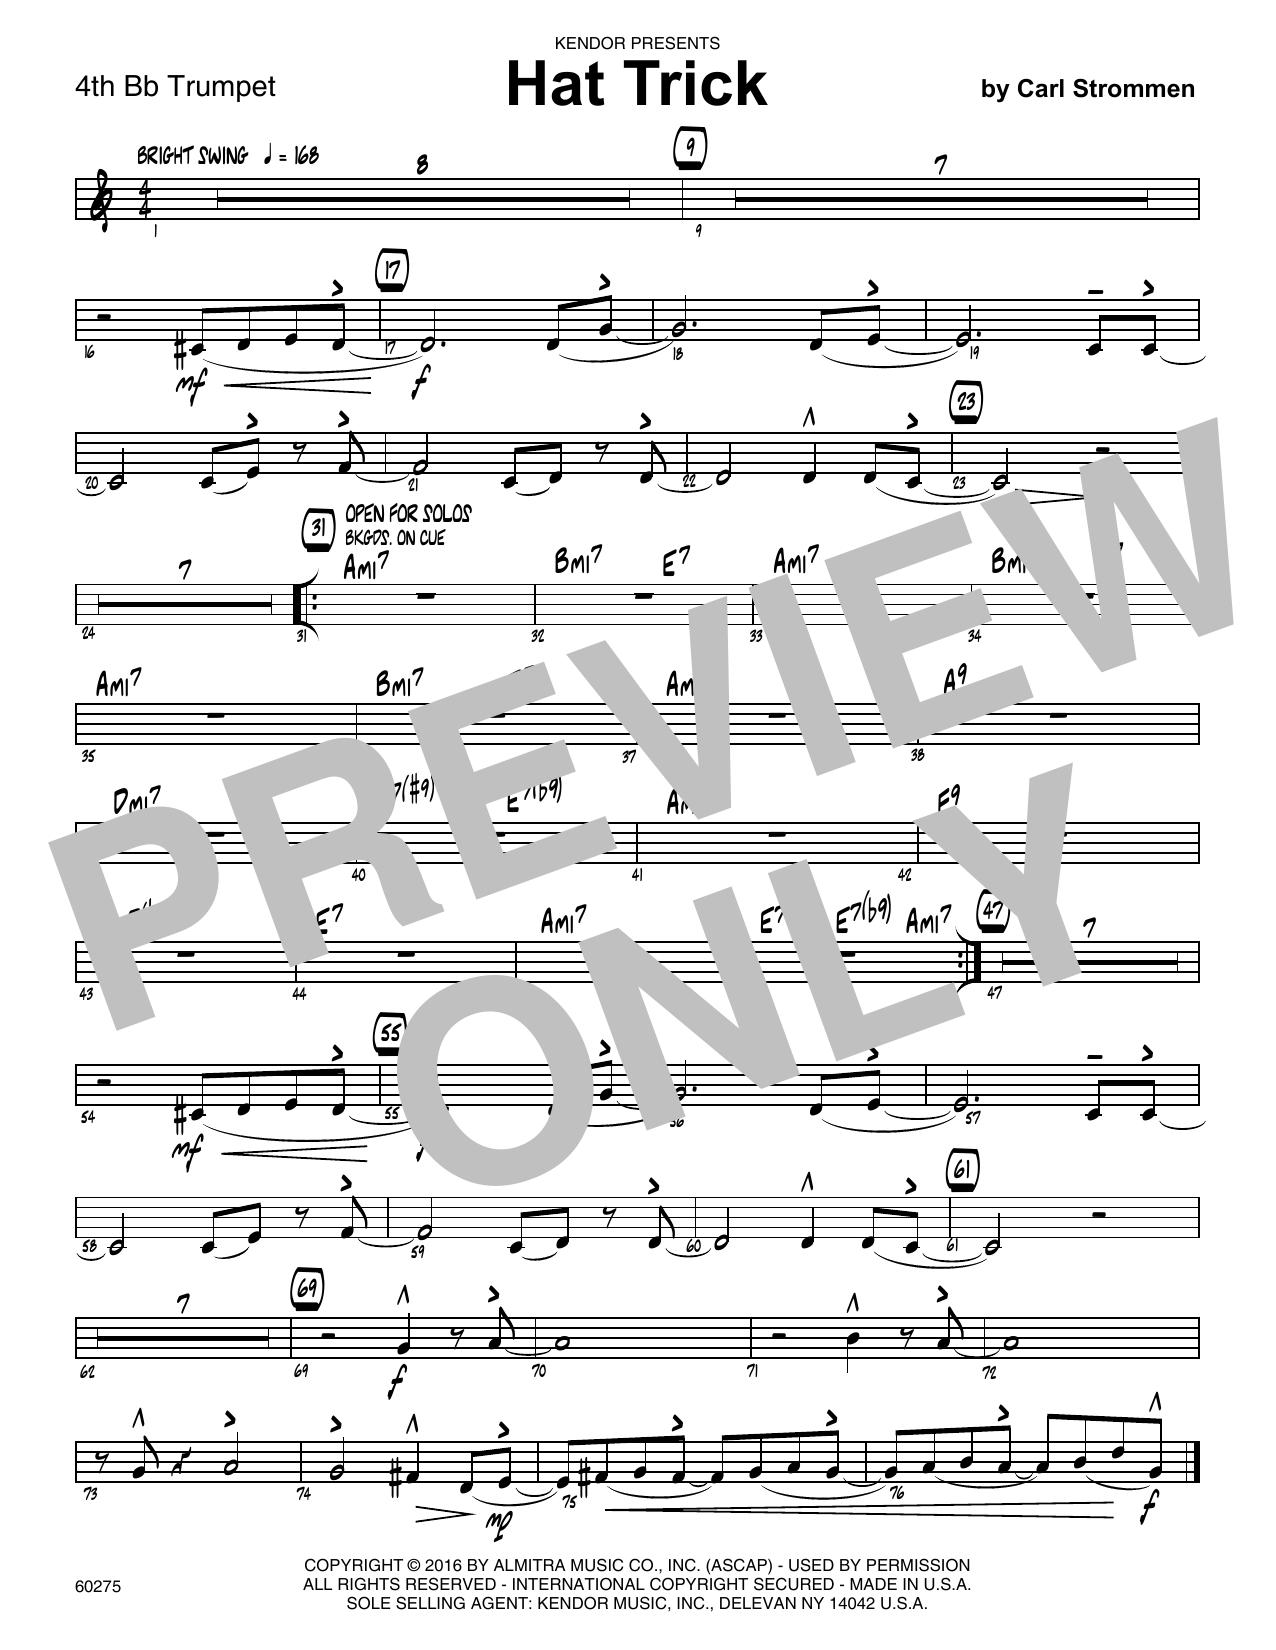 Hat Trick - 4th Bb Trumpet Sheet Music